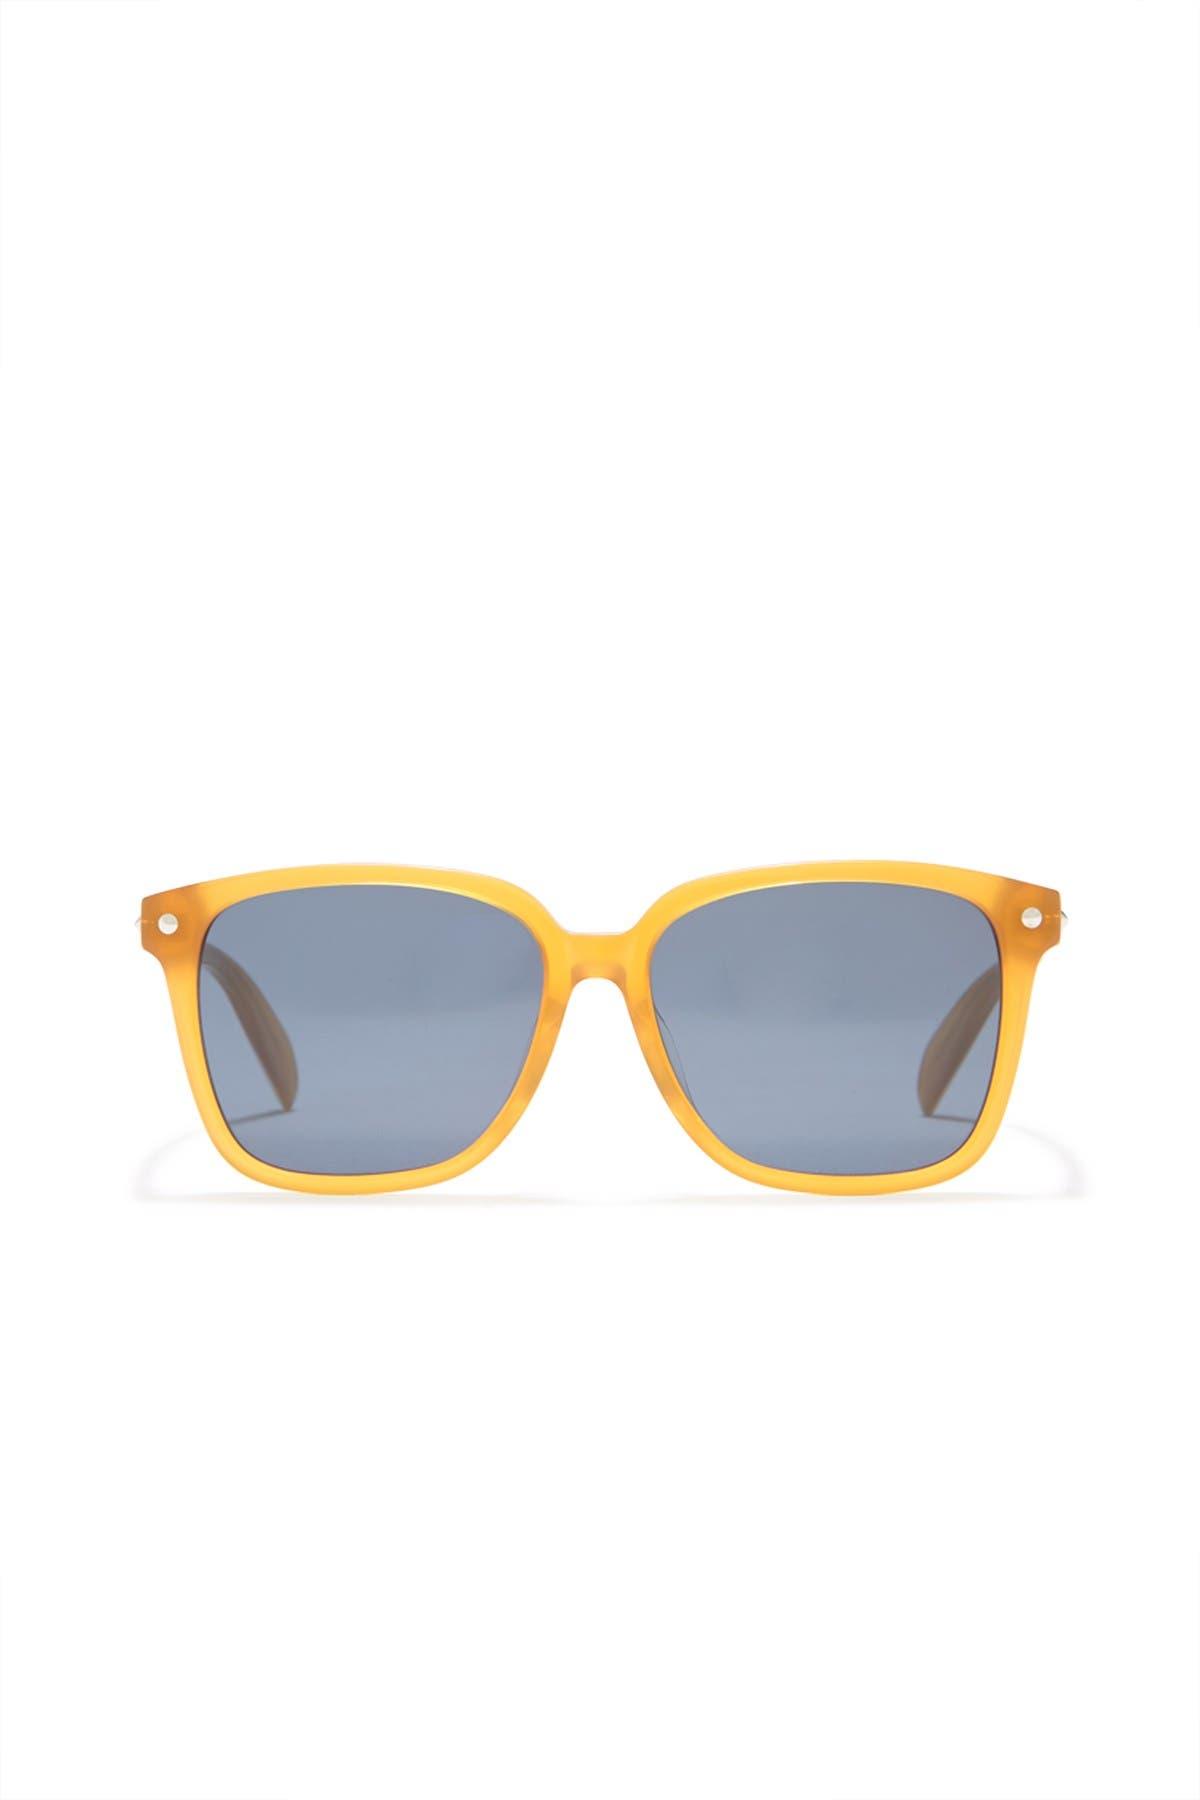 Image of Alexander McQueen 54mm Square Sunglasses